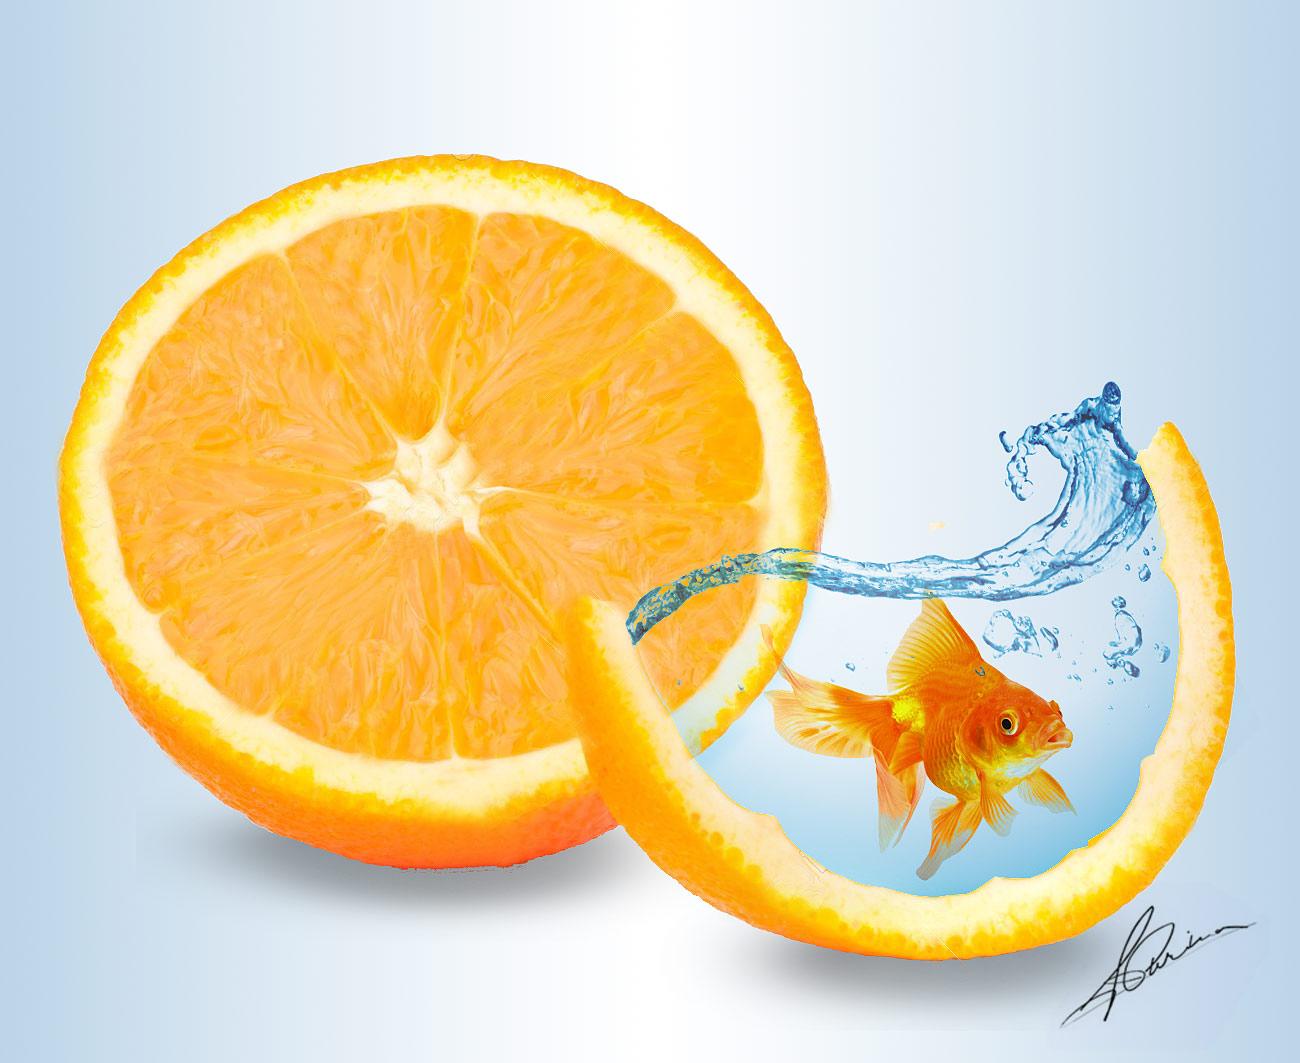 diseno-gold-fish-and-orange